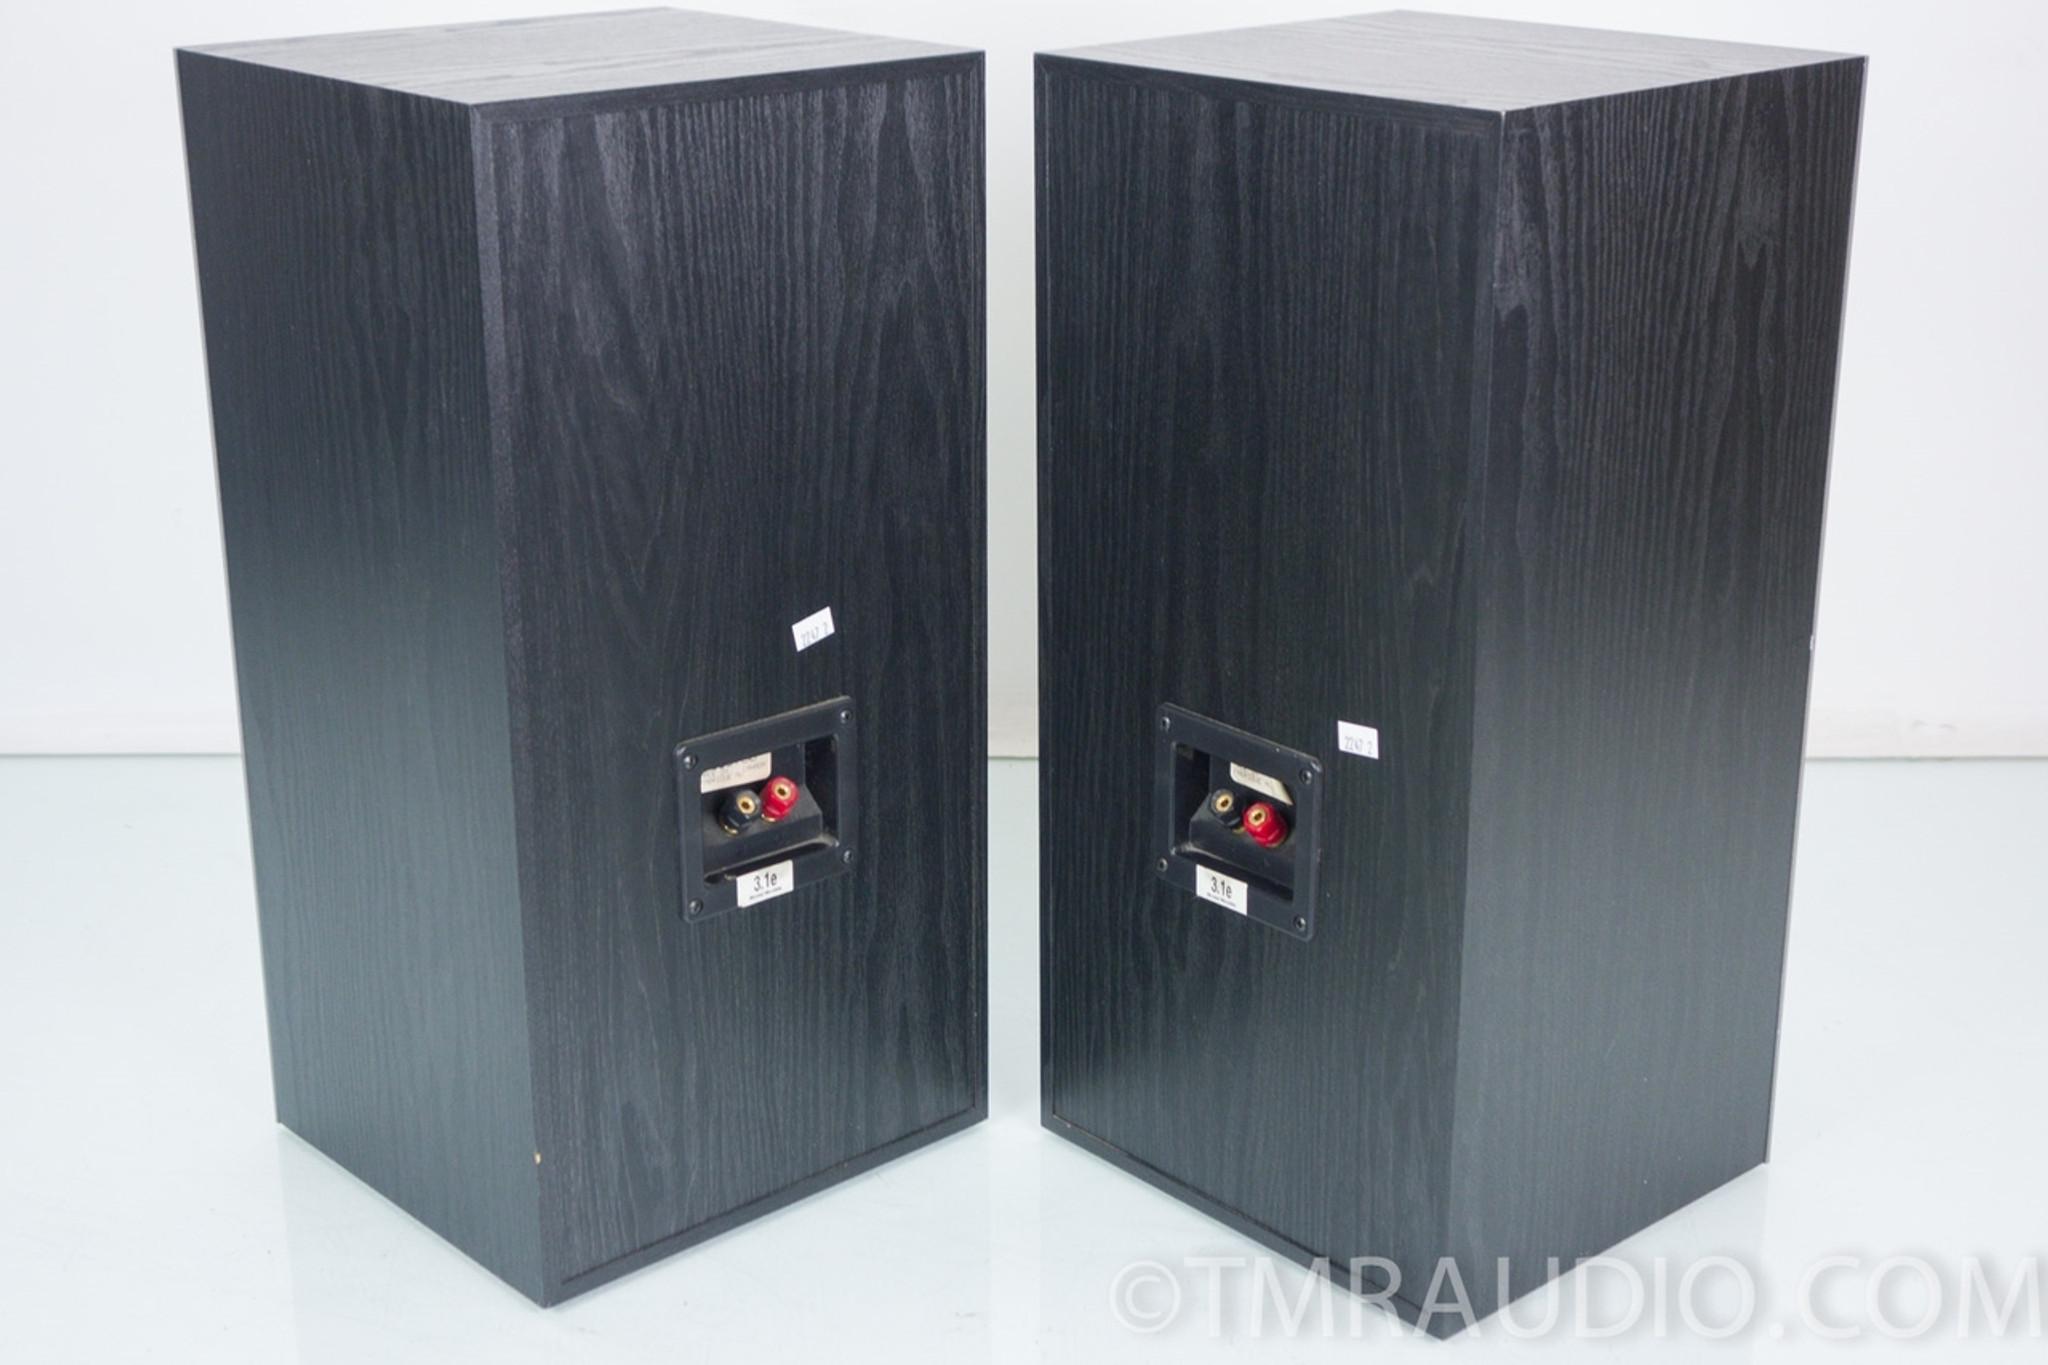 Energy 31e Bookshelf Speakers 2 Way Audiophile Monitors